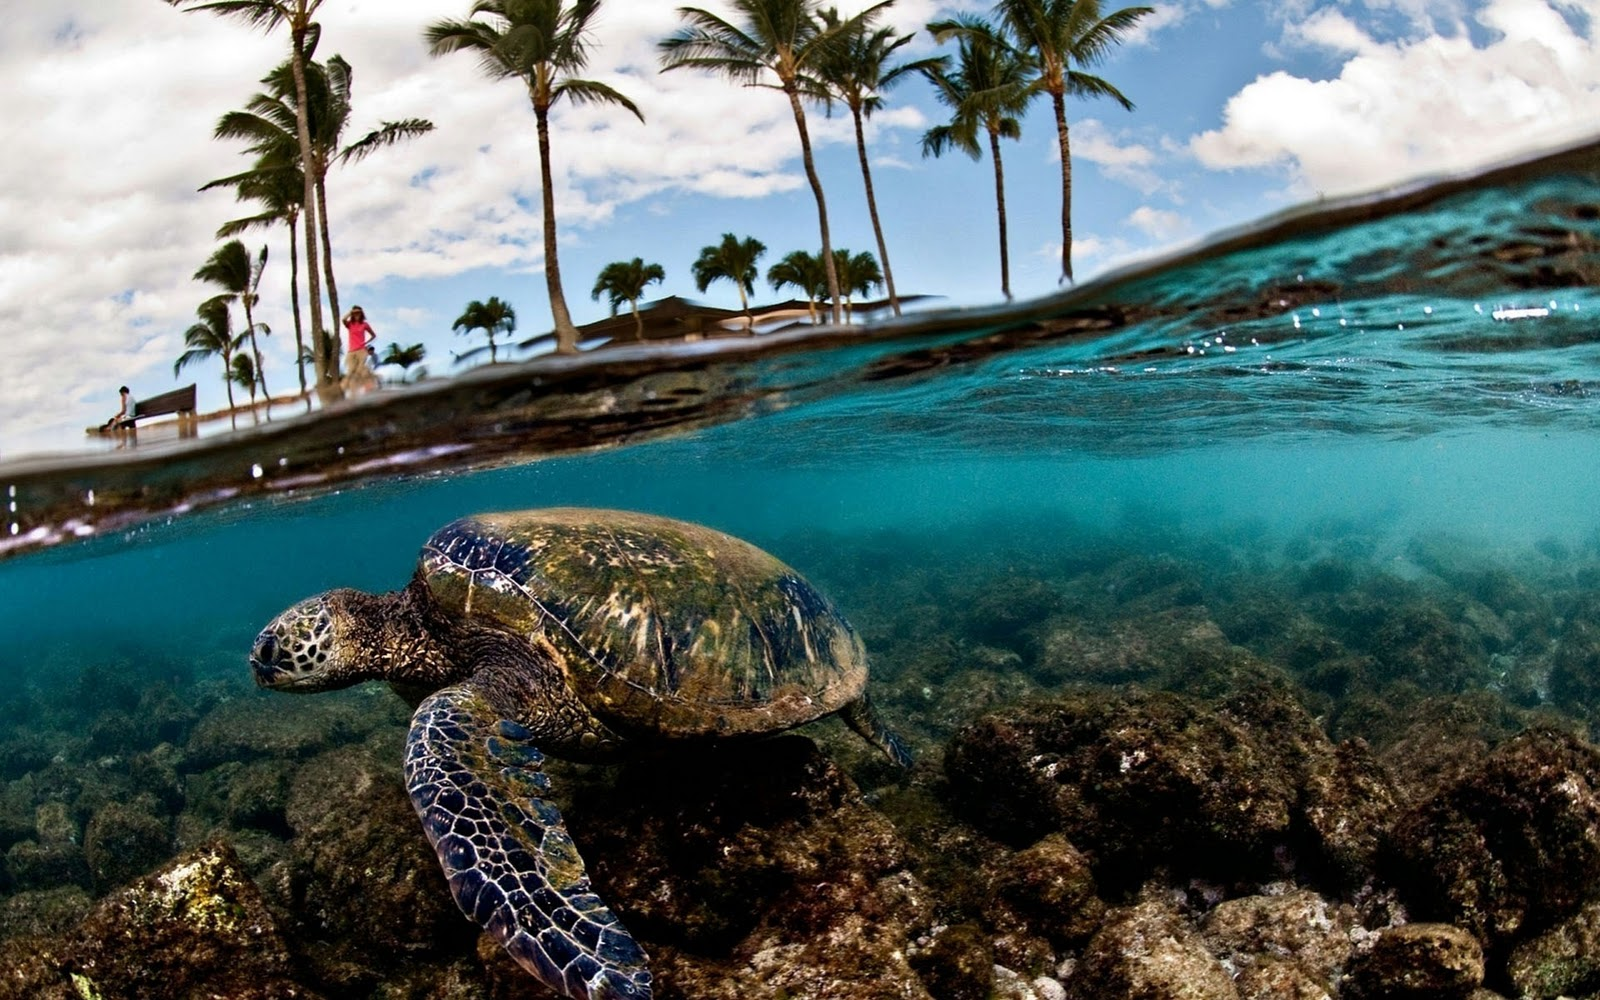 http://1.bp.blogspot.com/-kTjSrnTaNVI/TyAaklnmLvI/AAAAAAAAXvk/6RDa9Y5U4xA/s1600/Schildpadden-achtergronden-dieren-hd-schildpad-wallpapers-foto-3.jpg